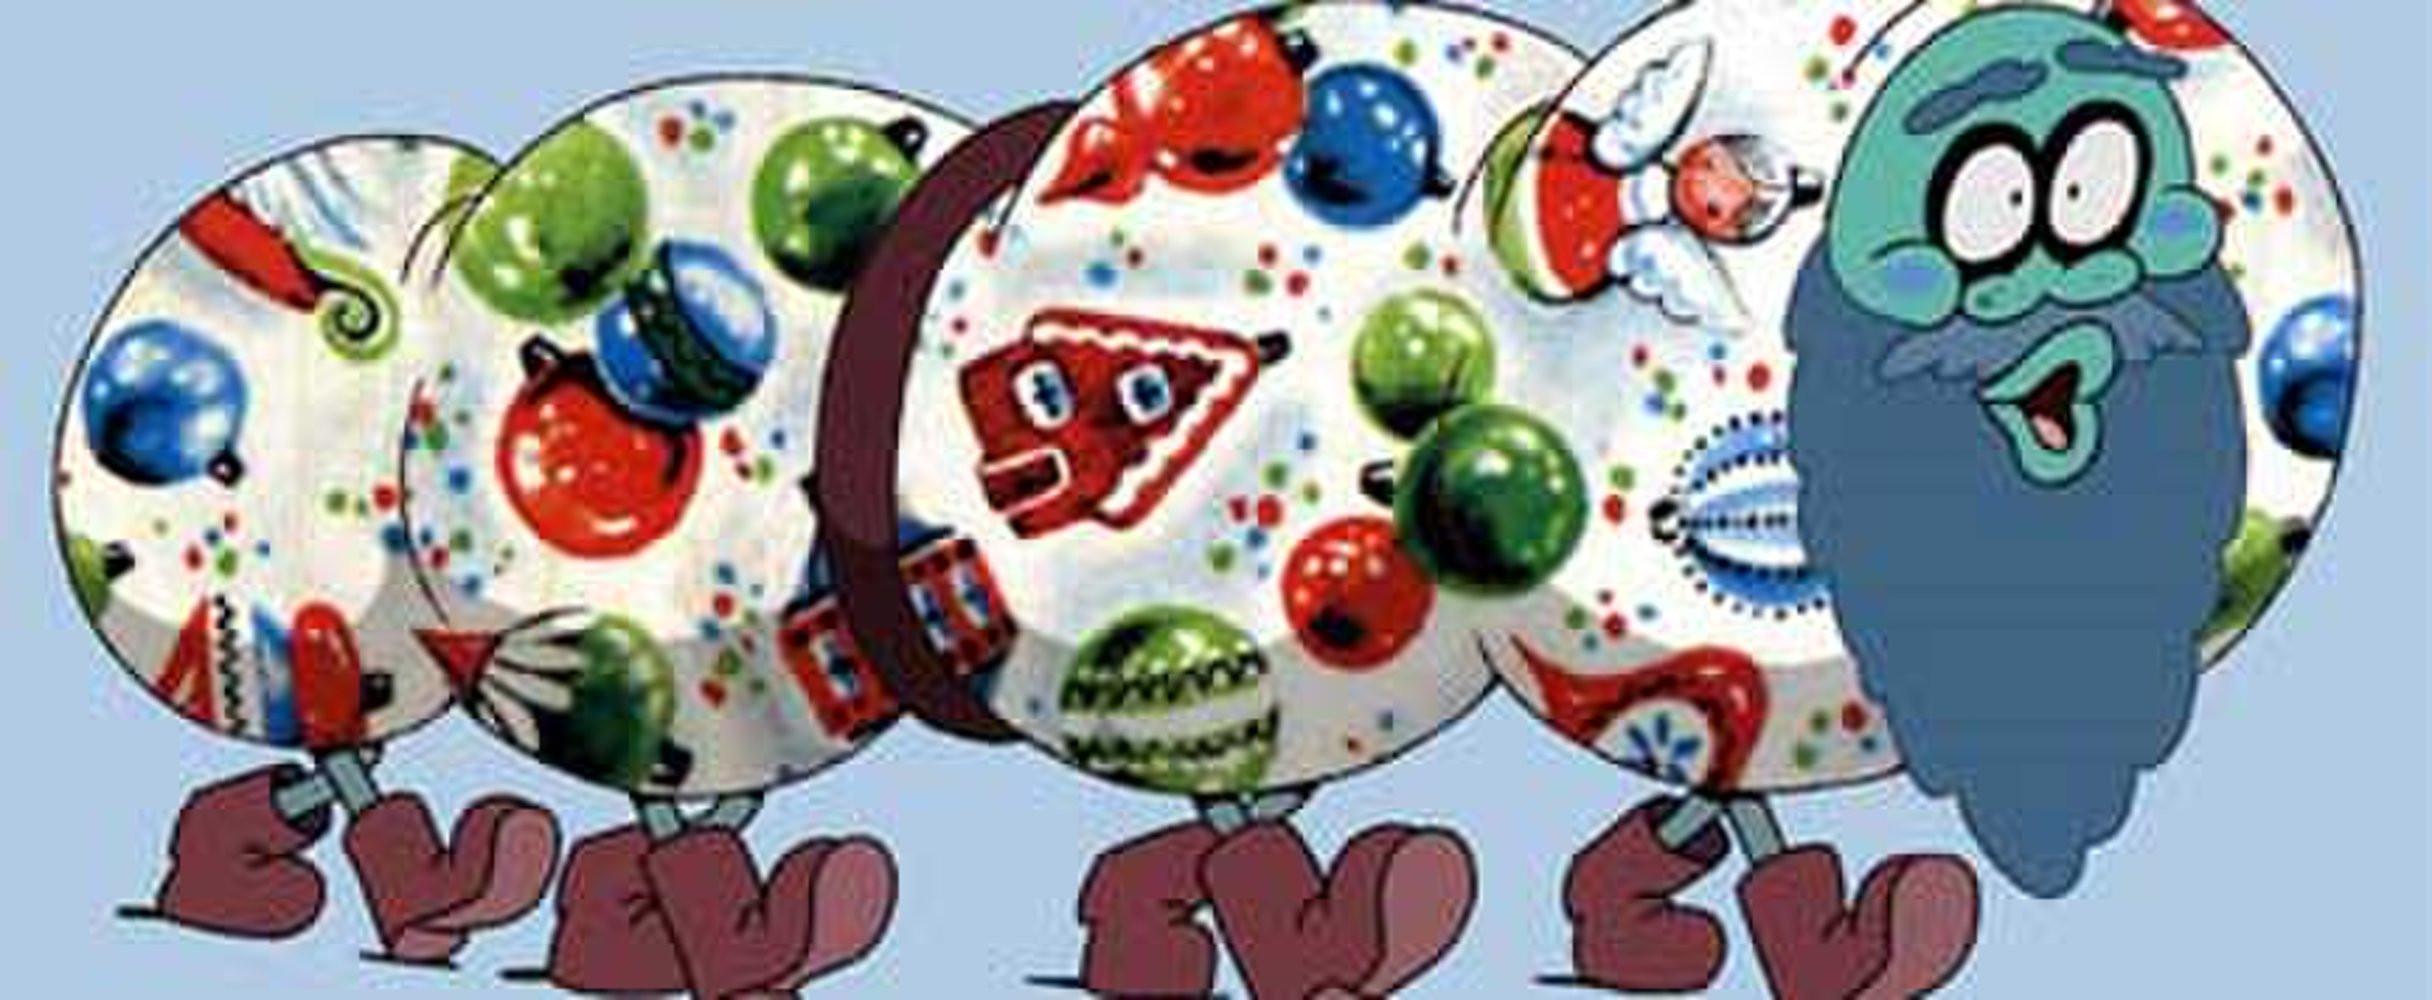 Chowder Christmas Special  Ani Shorts A Very Chowder Christmas